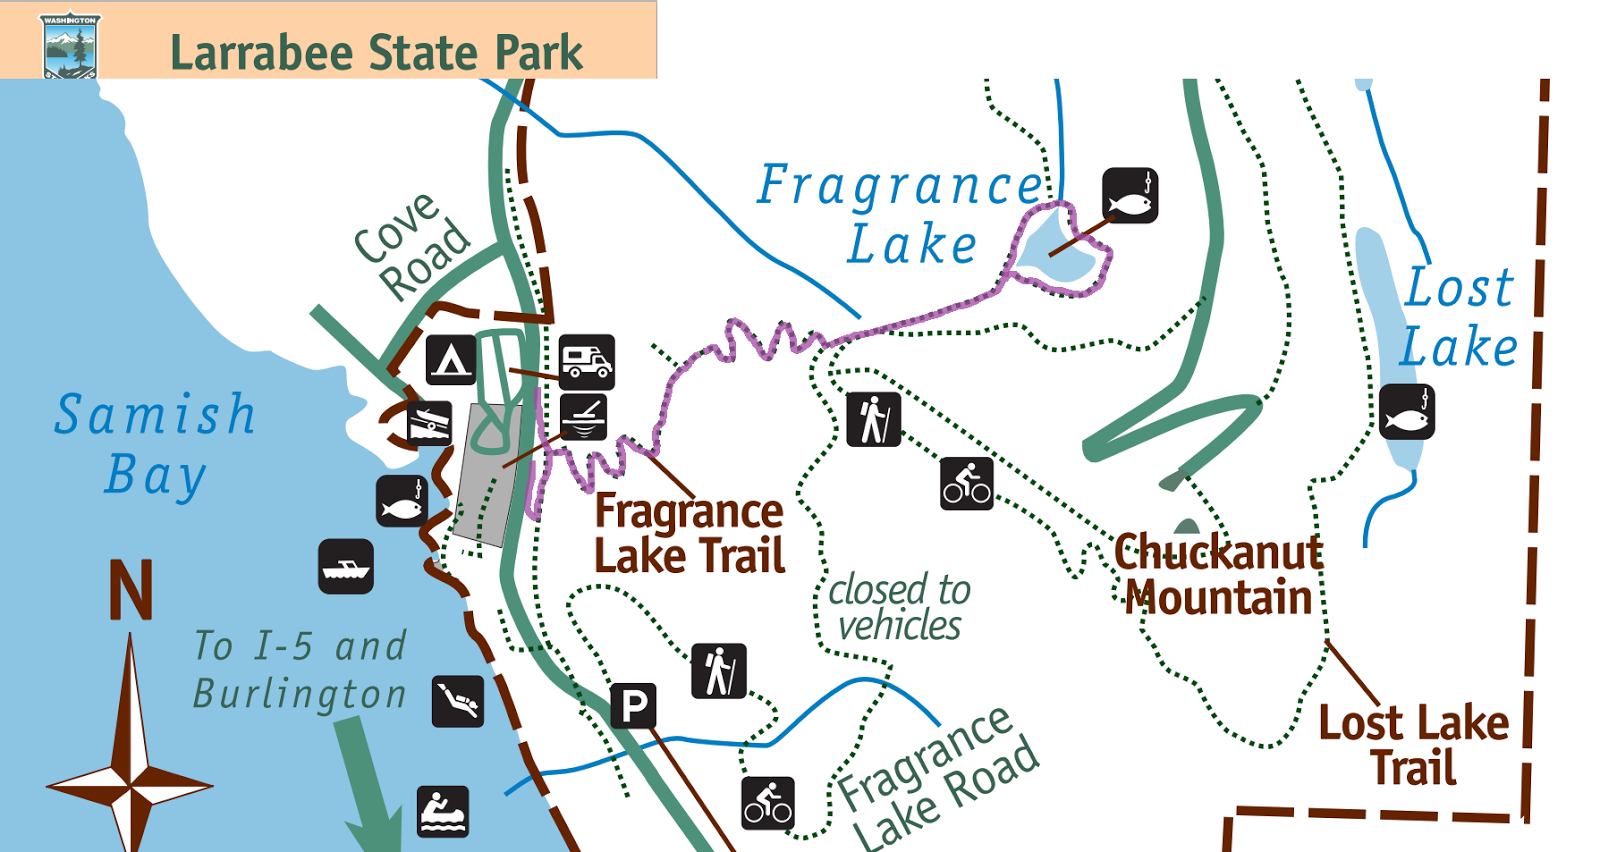 fragrance lake larrabee state park